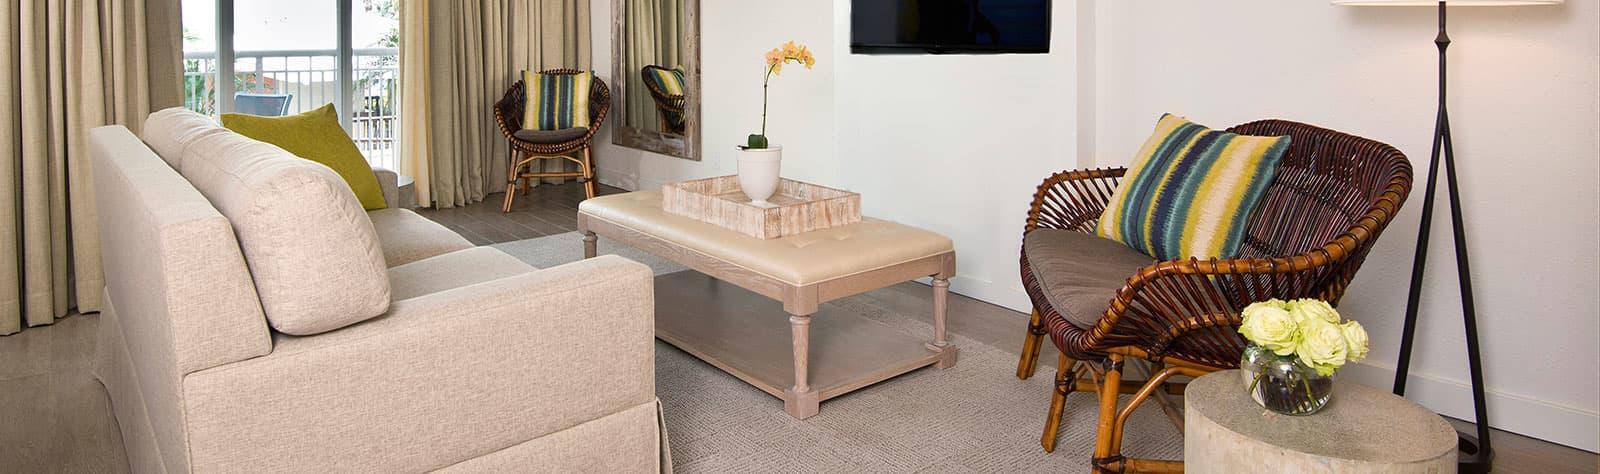 Queen Suites in Beach House Suites, St. Pete Beach